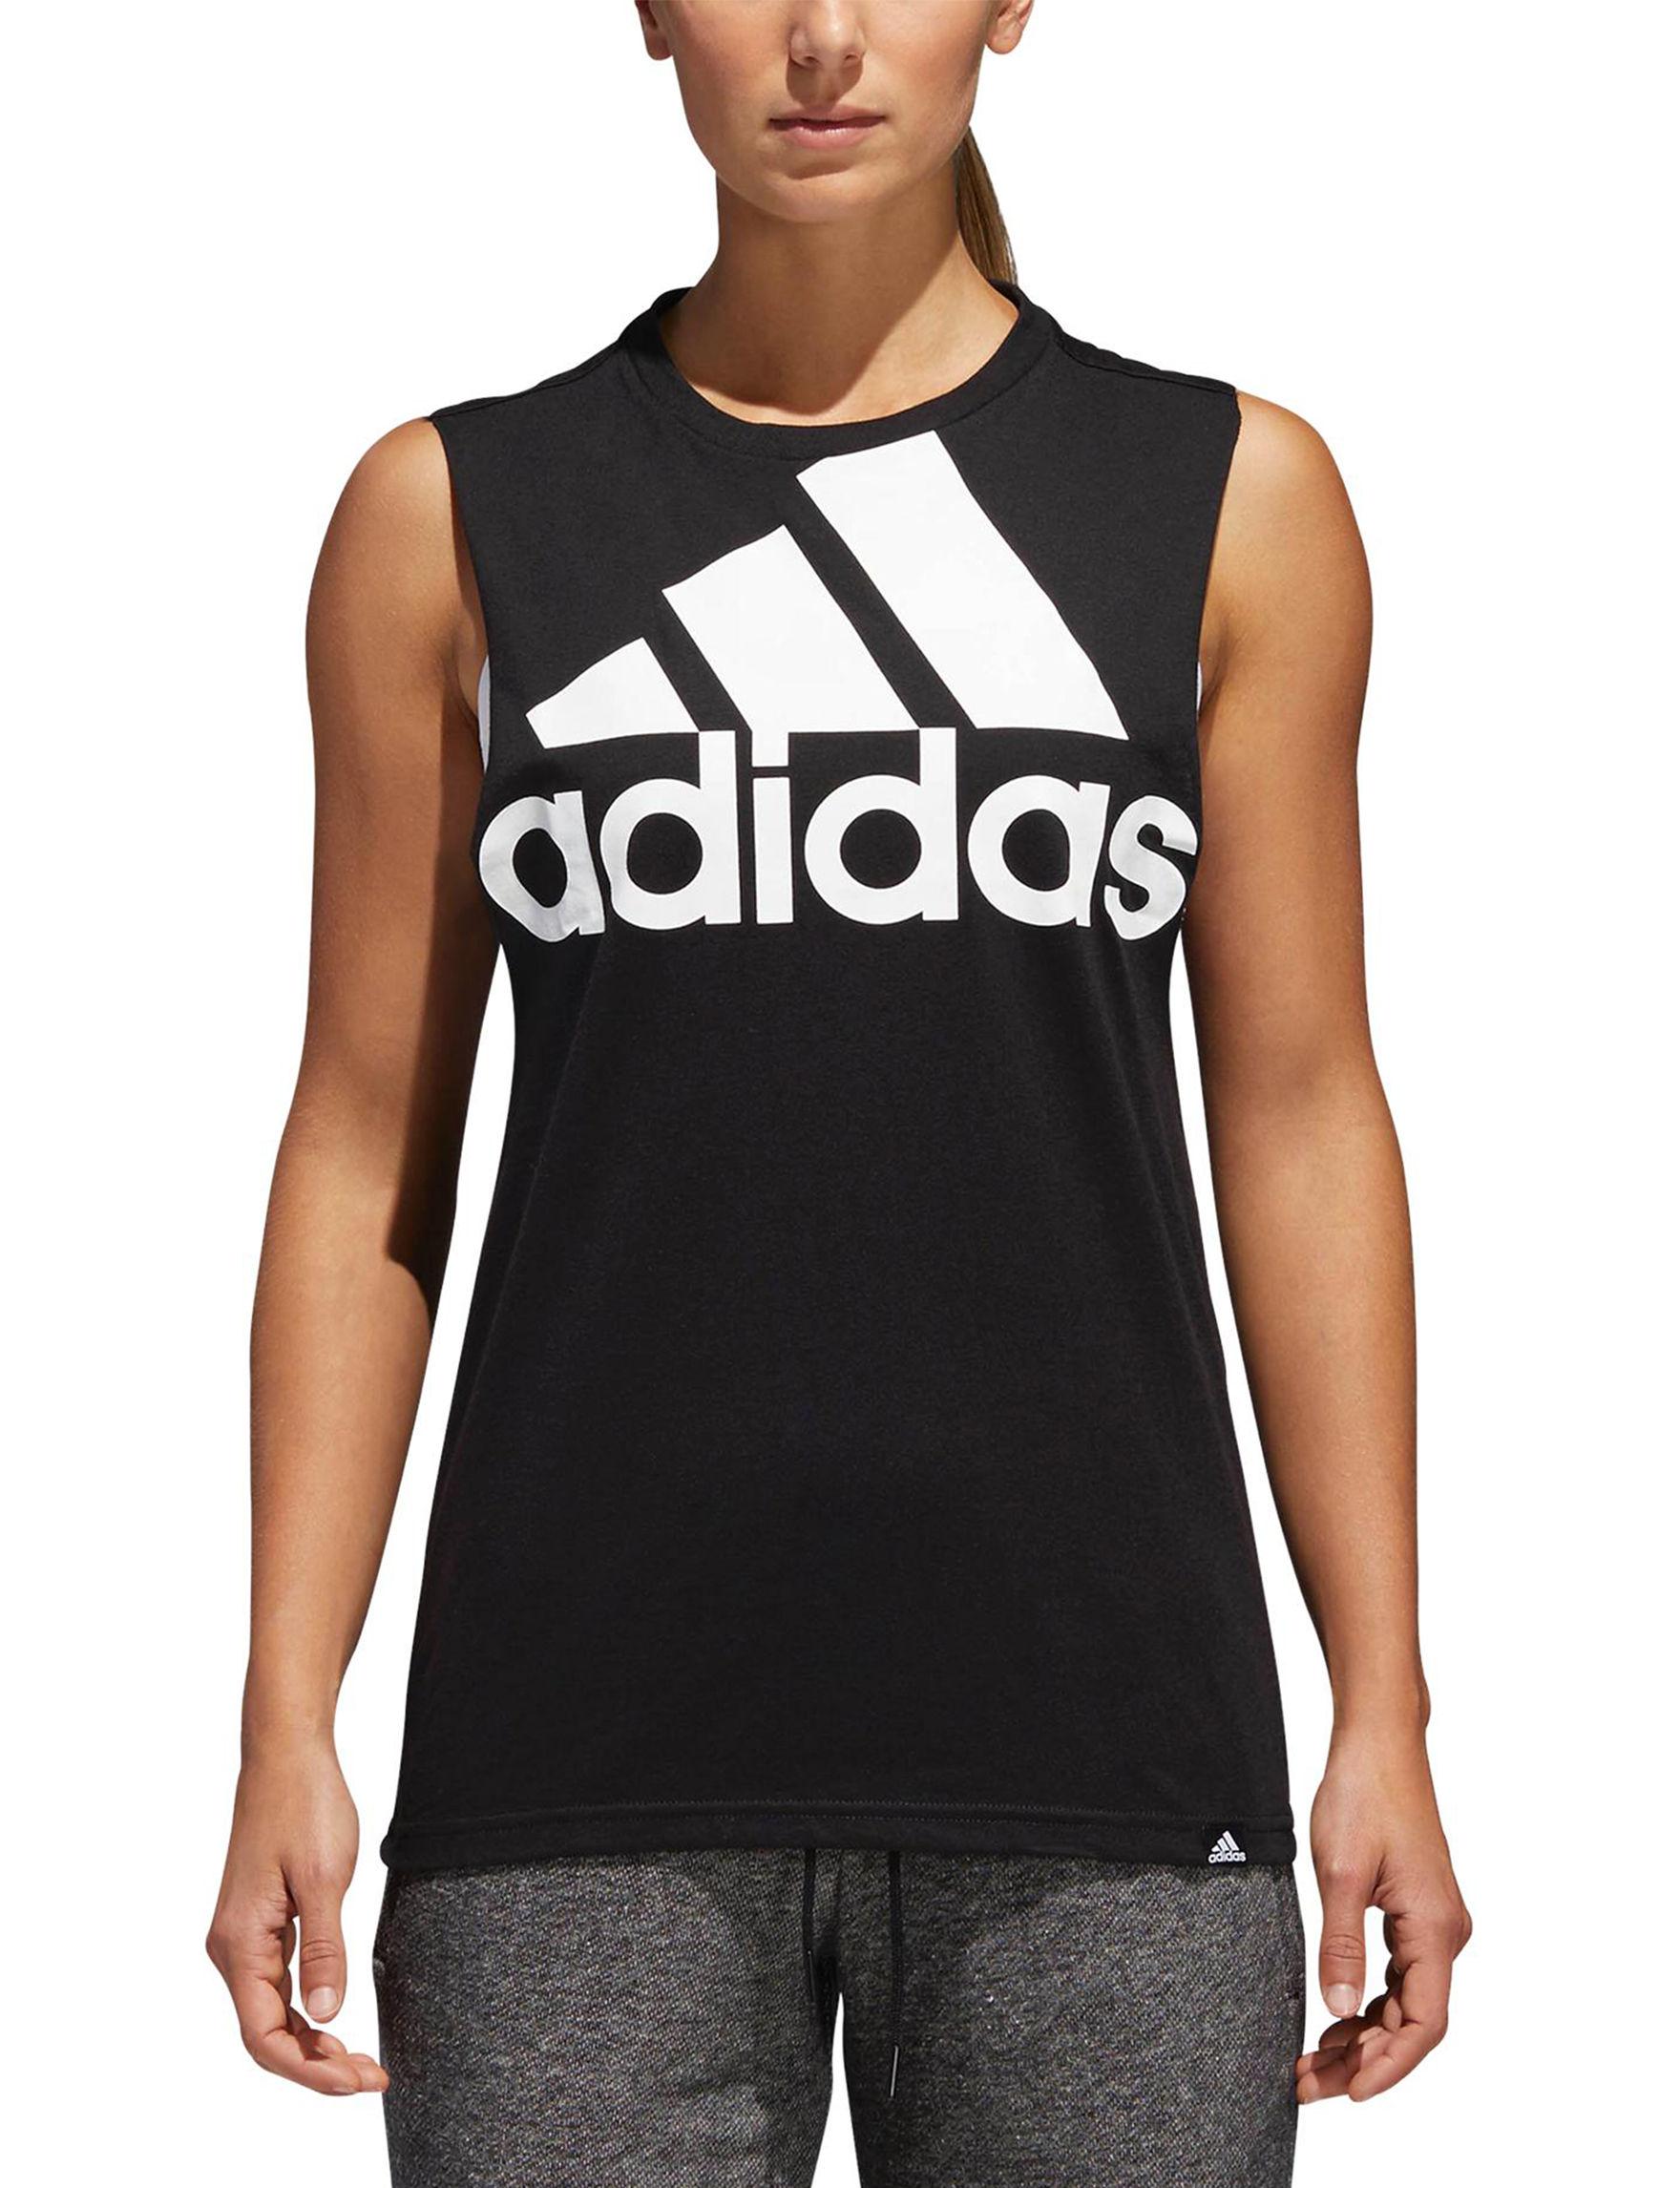 Adidas Black /  White Tees & Tanks